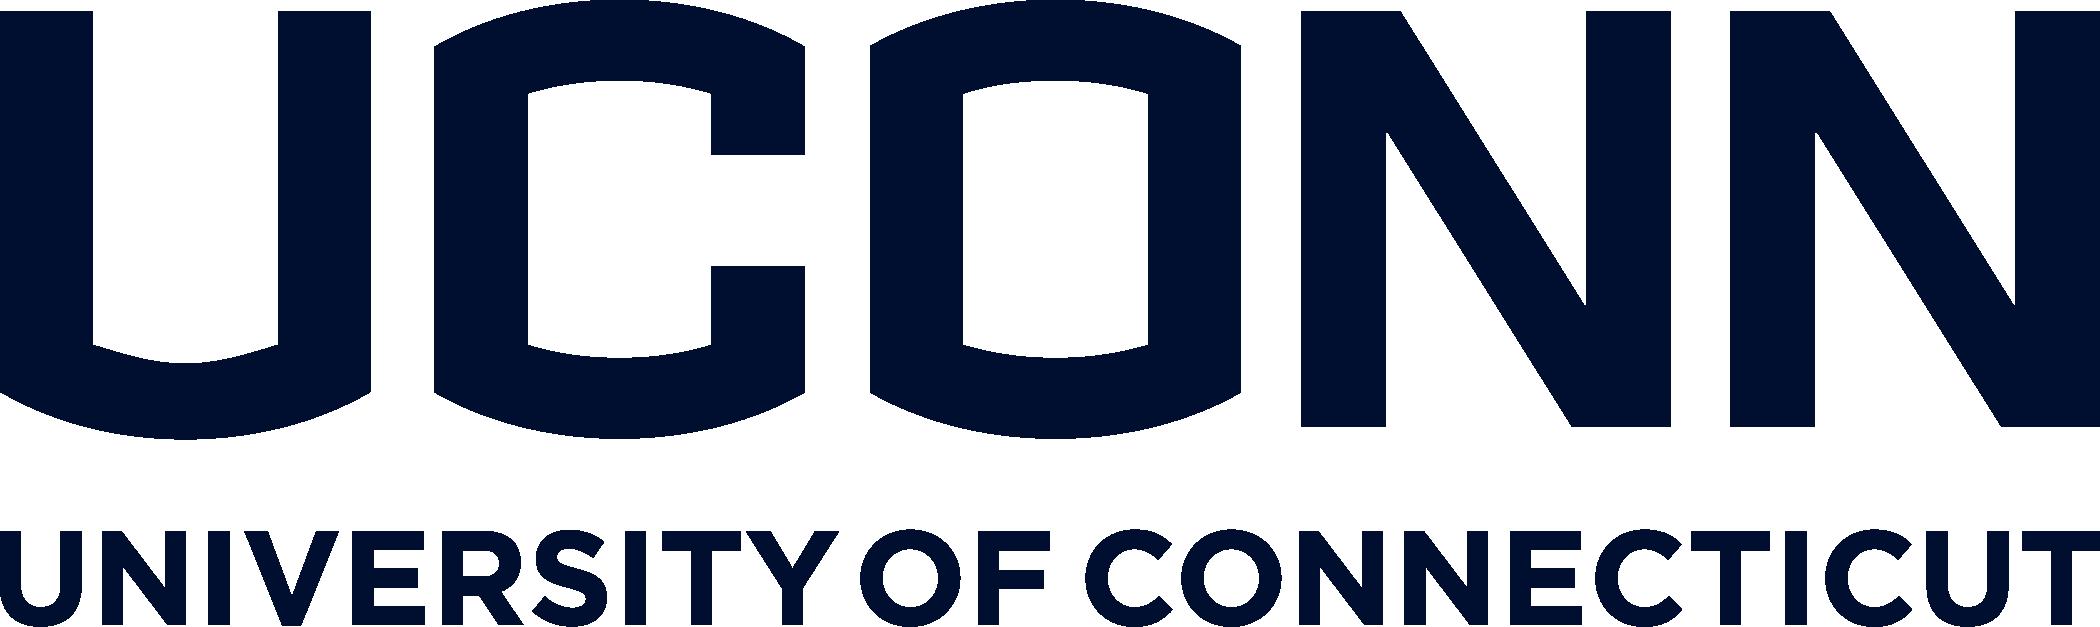 UConn wordmark